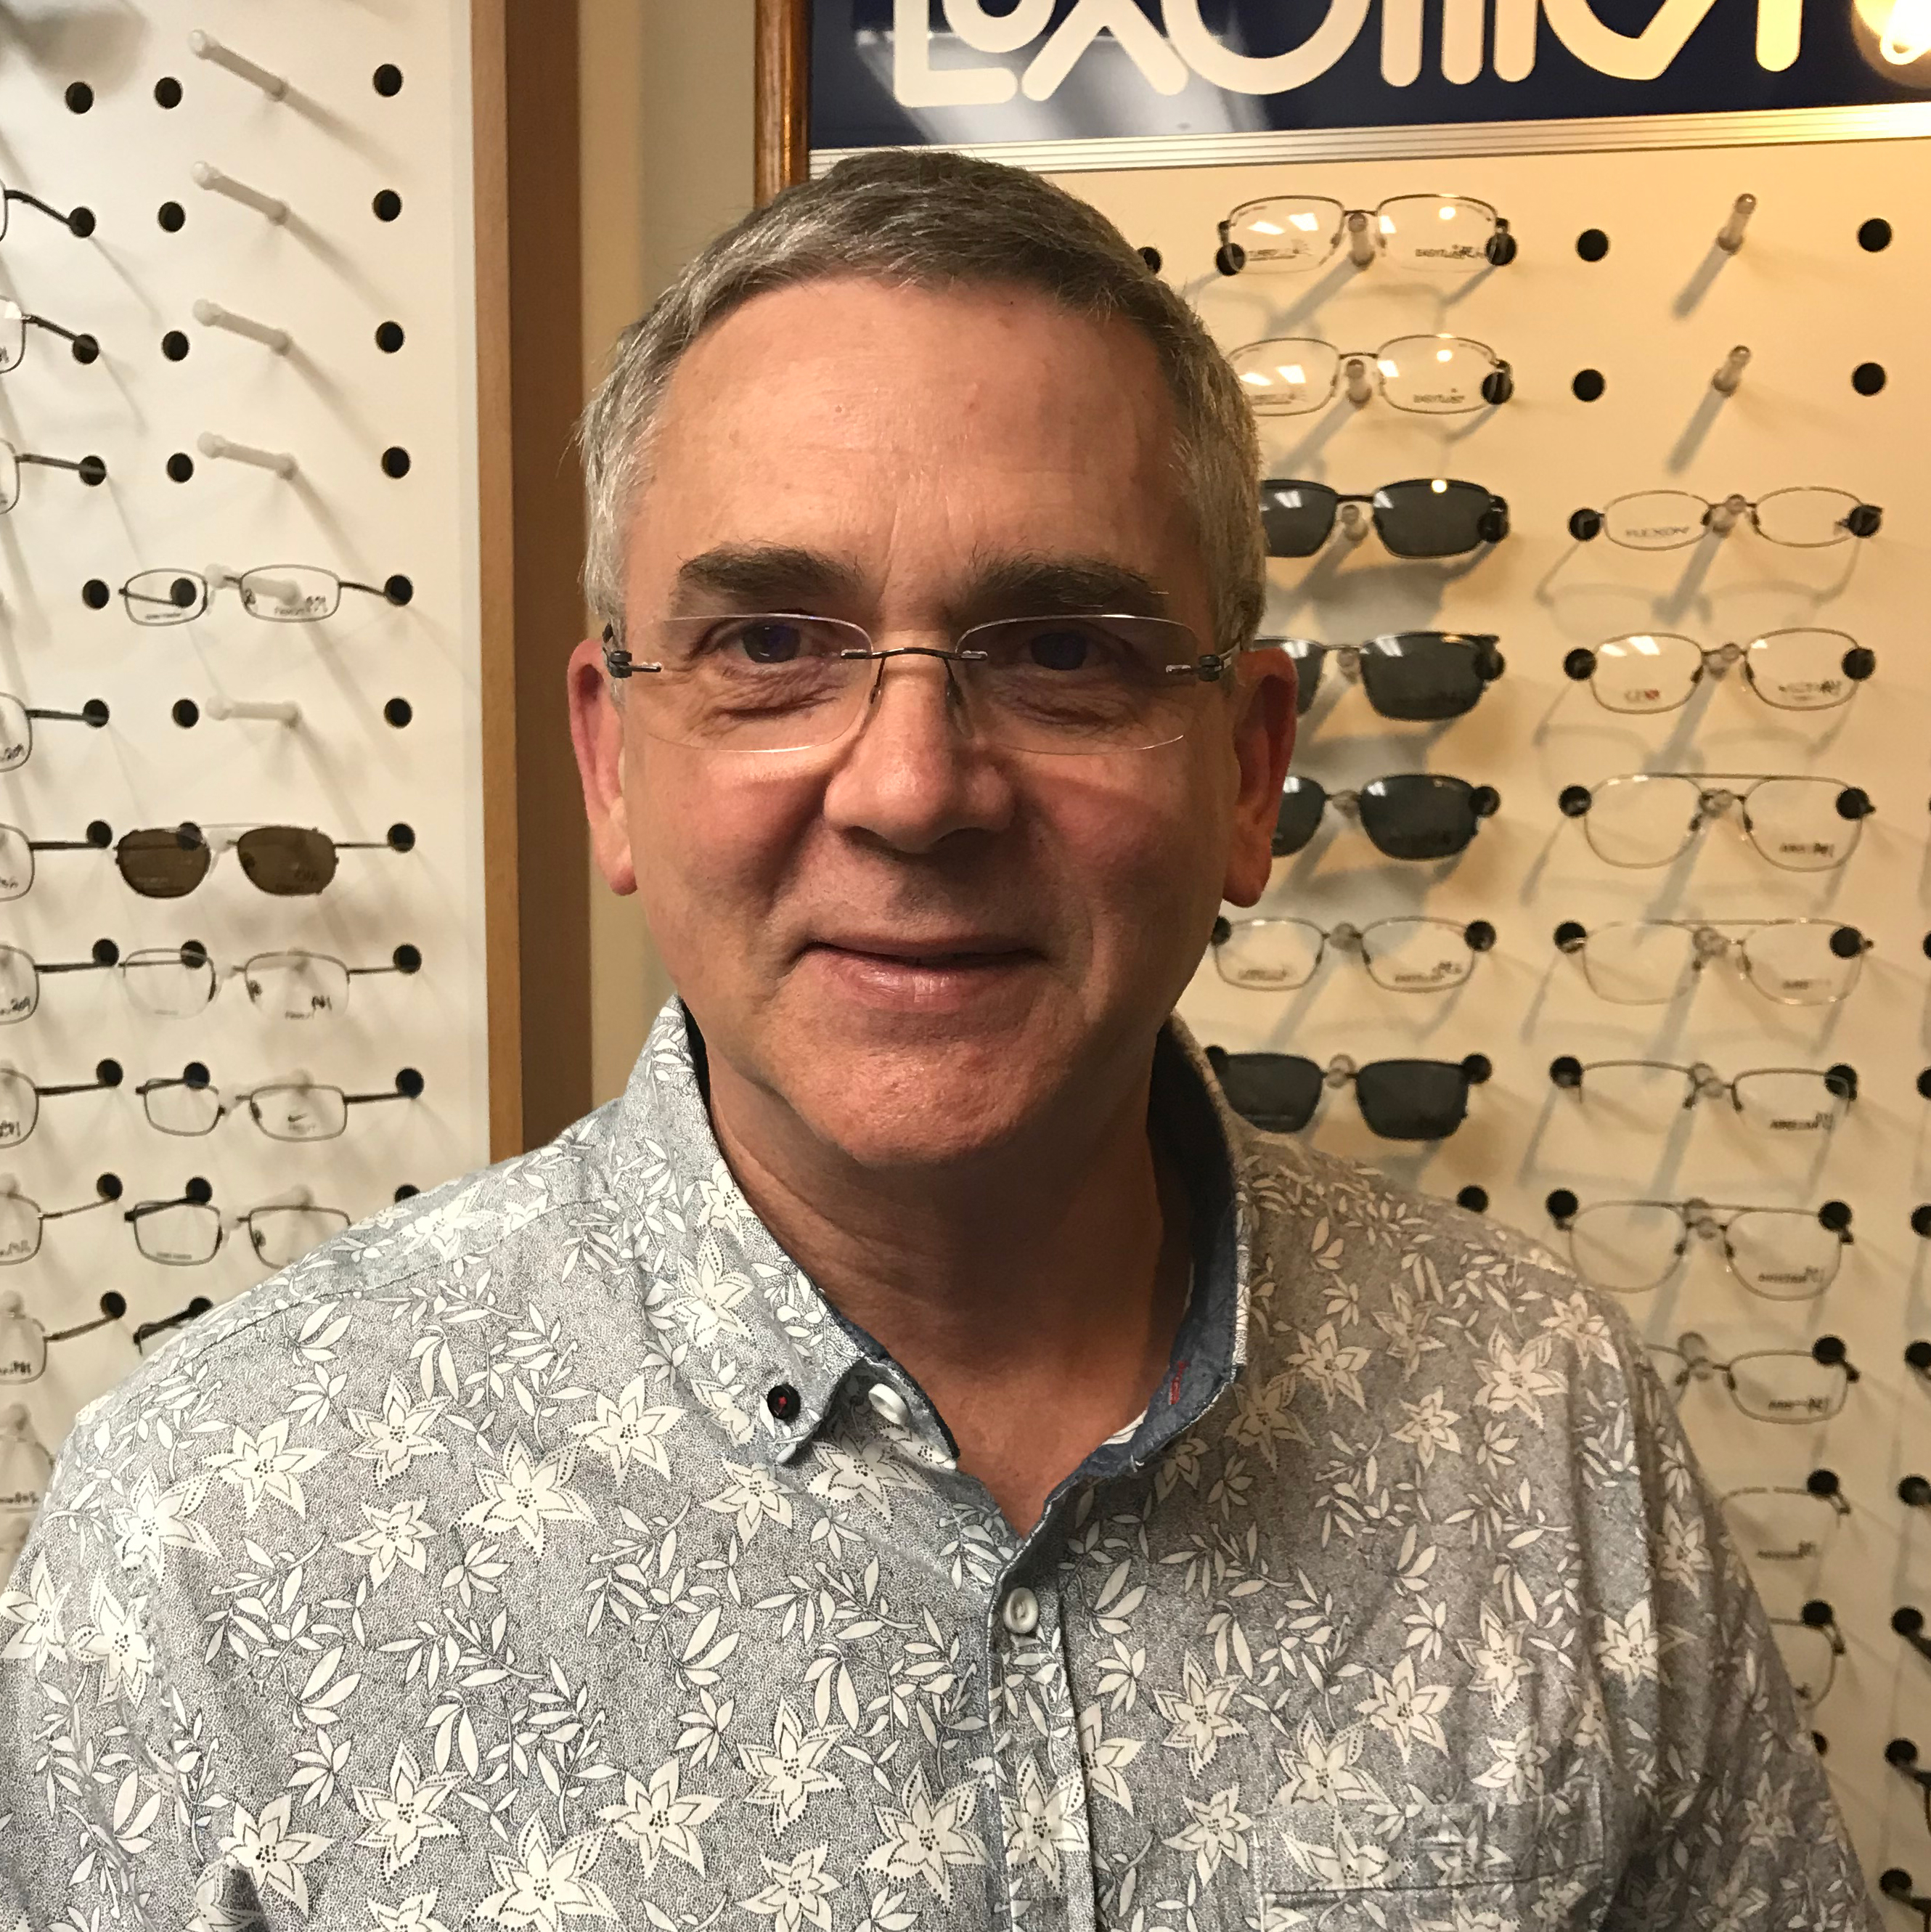 Lee Whitaker, OD Optometry